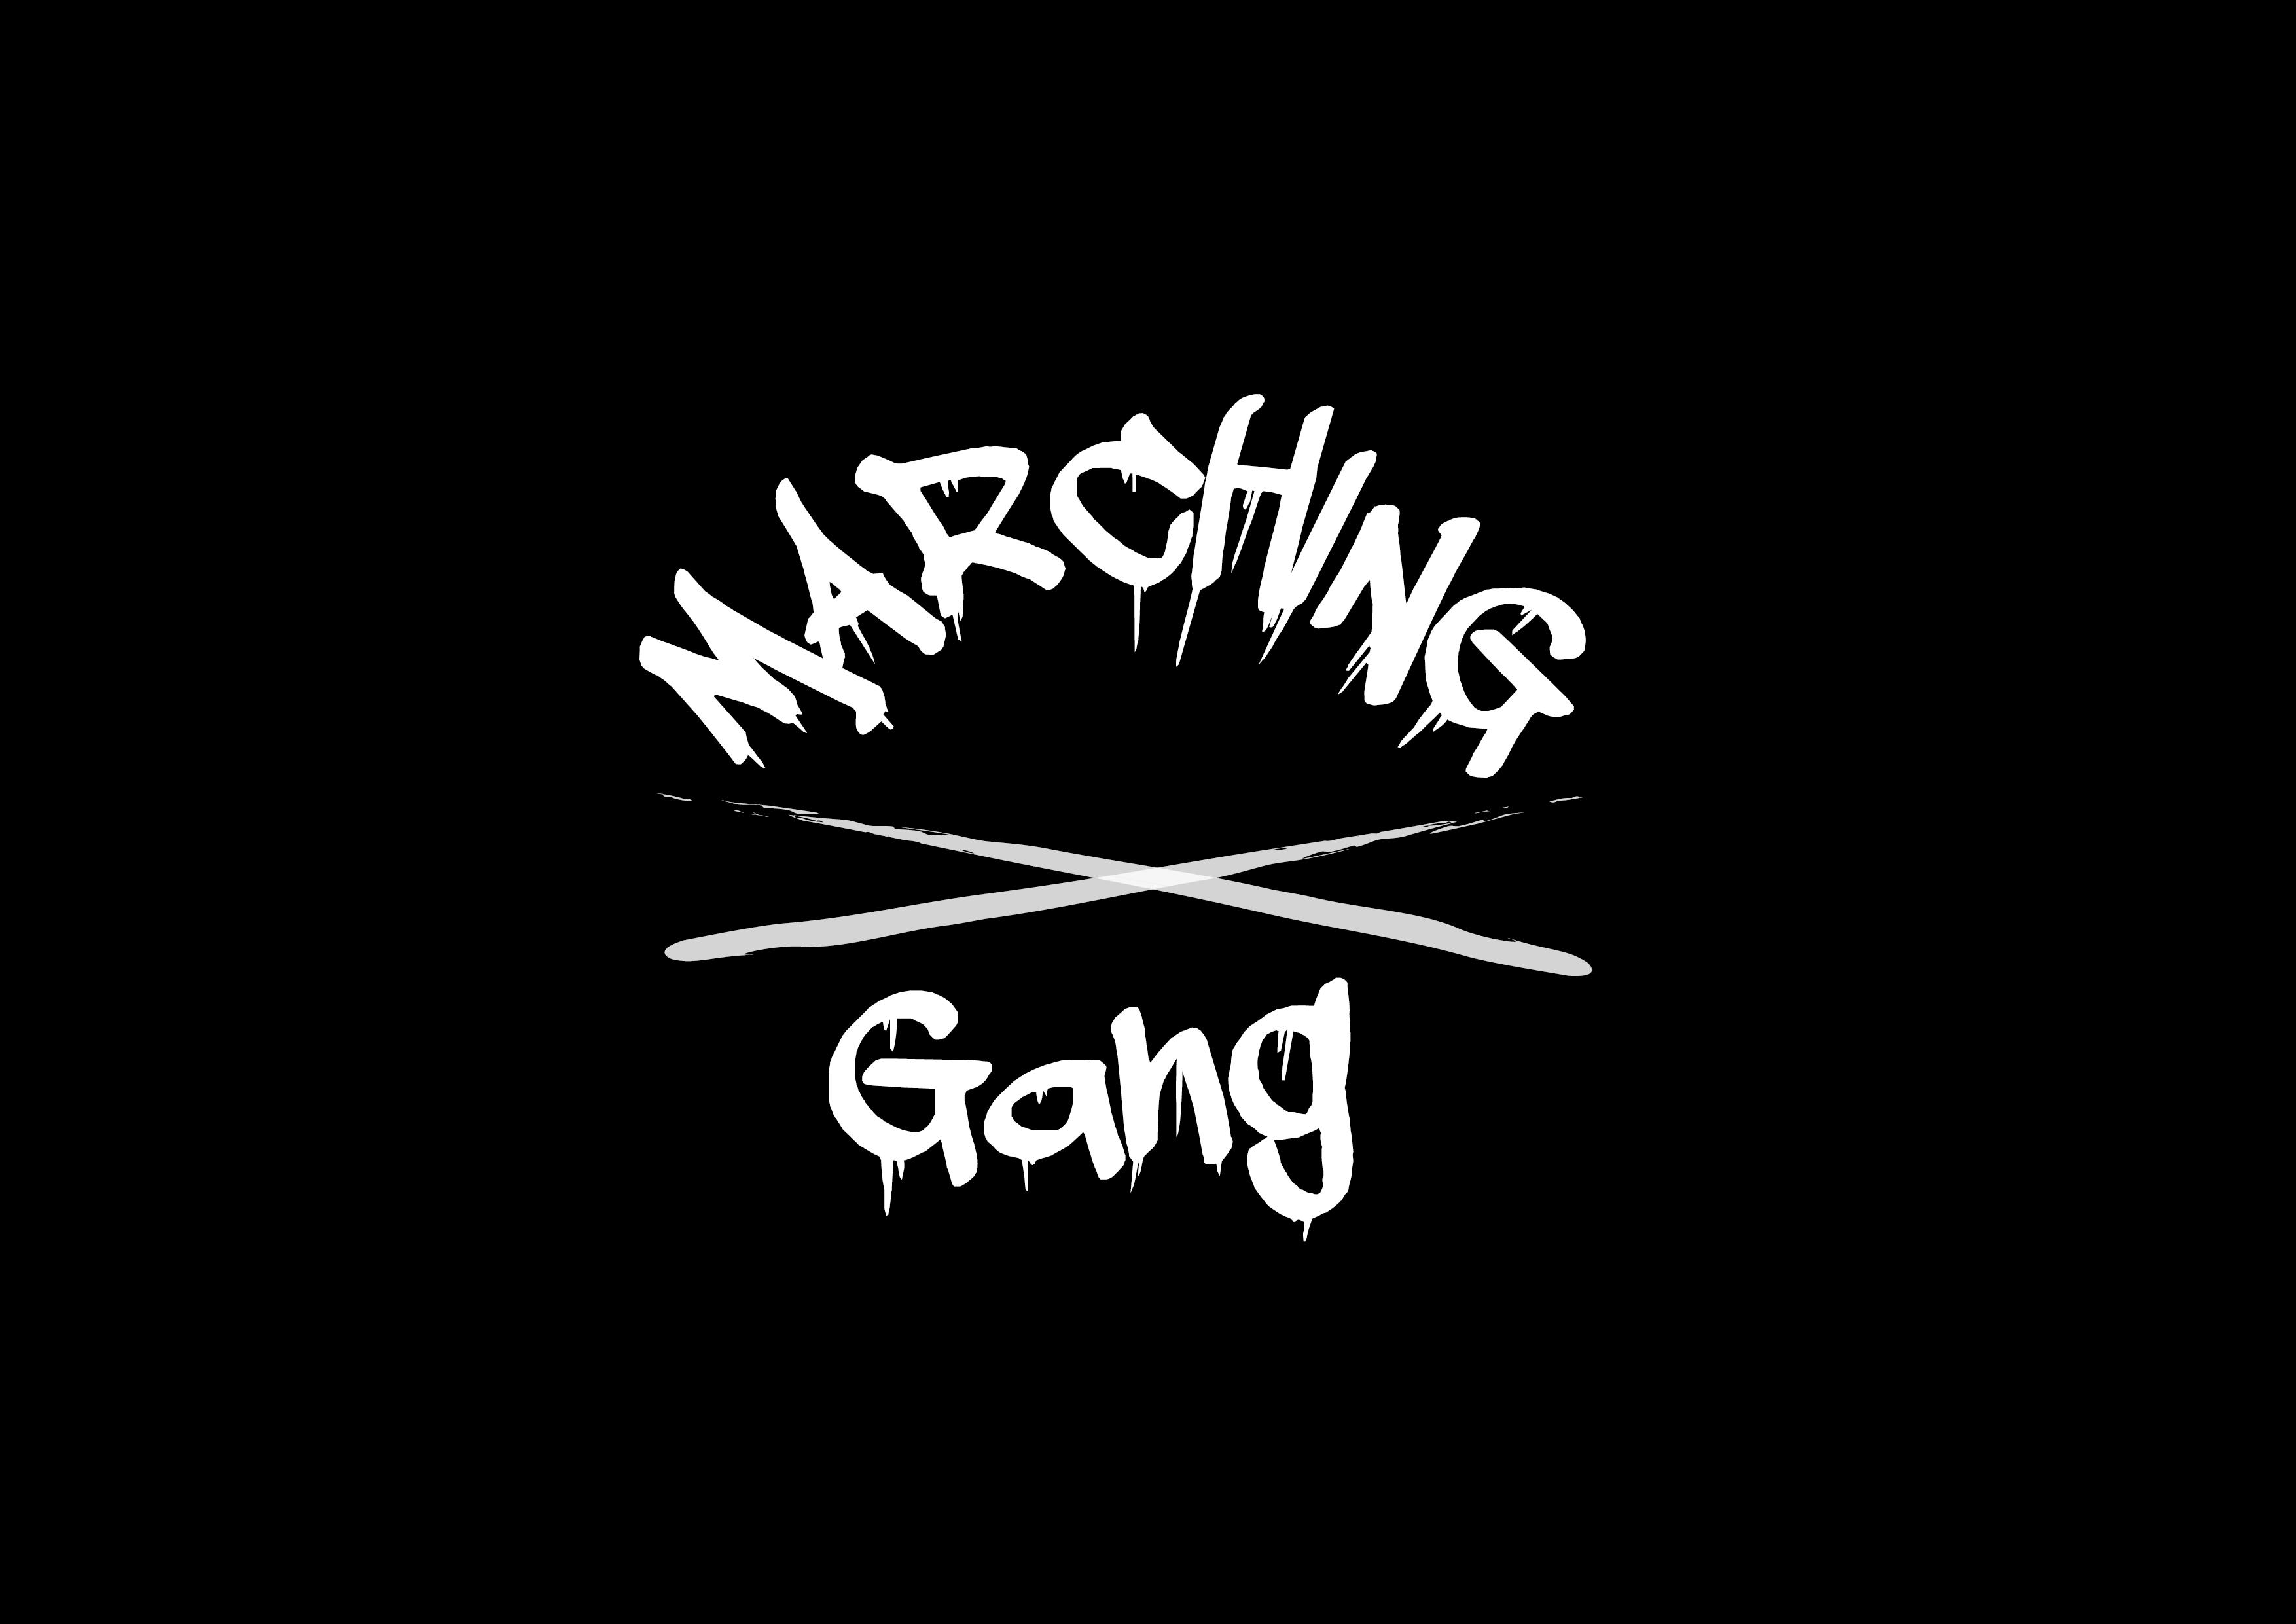 MARCHING GANG